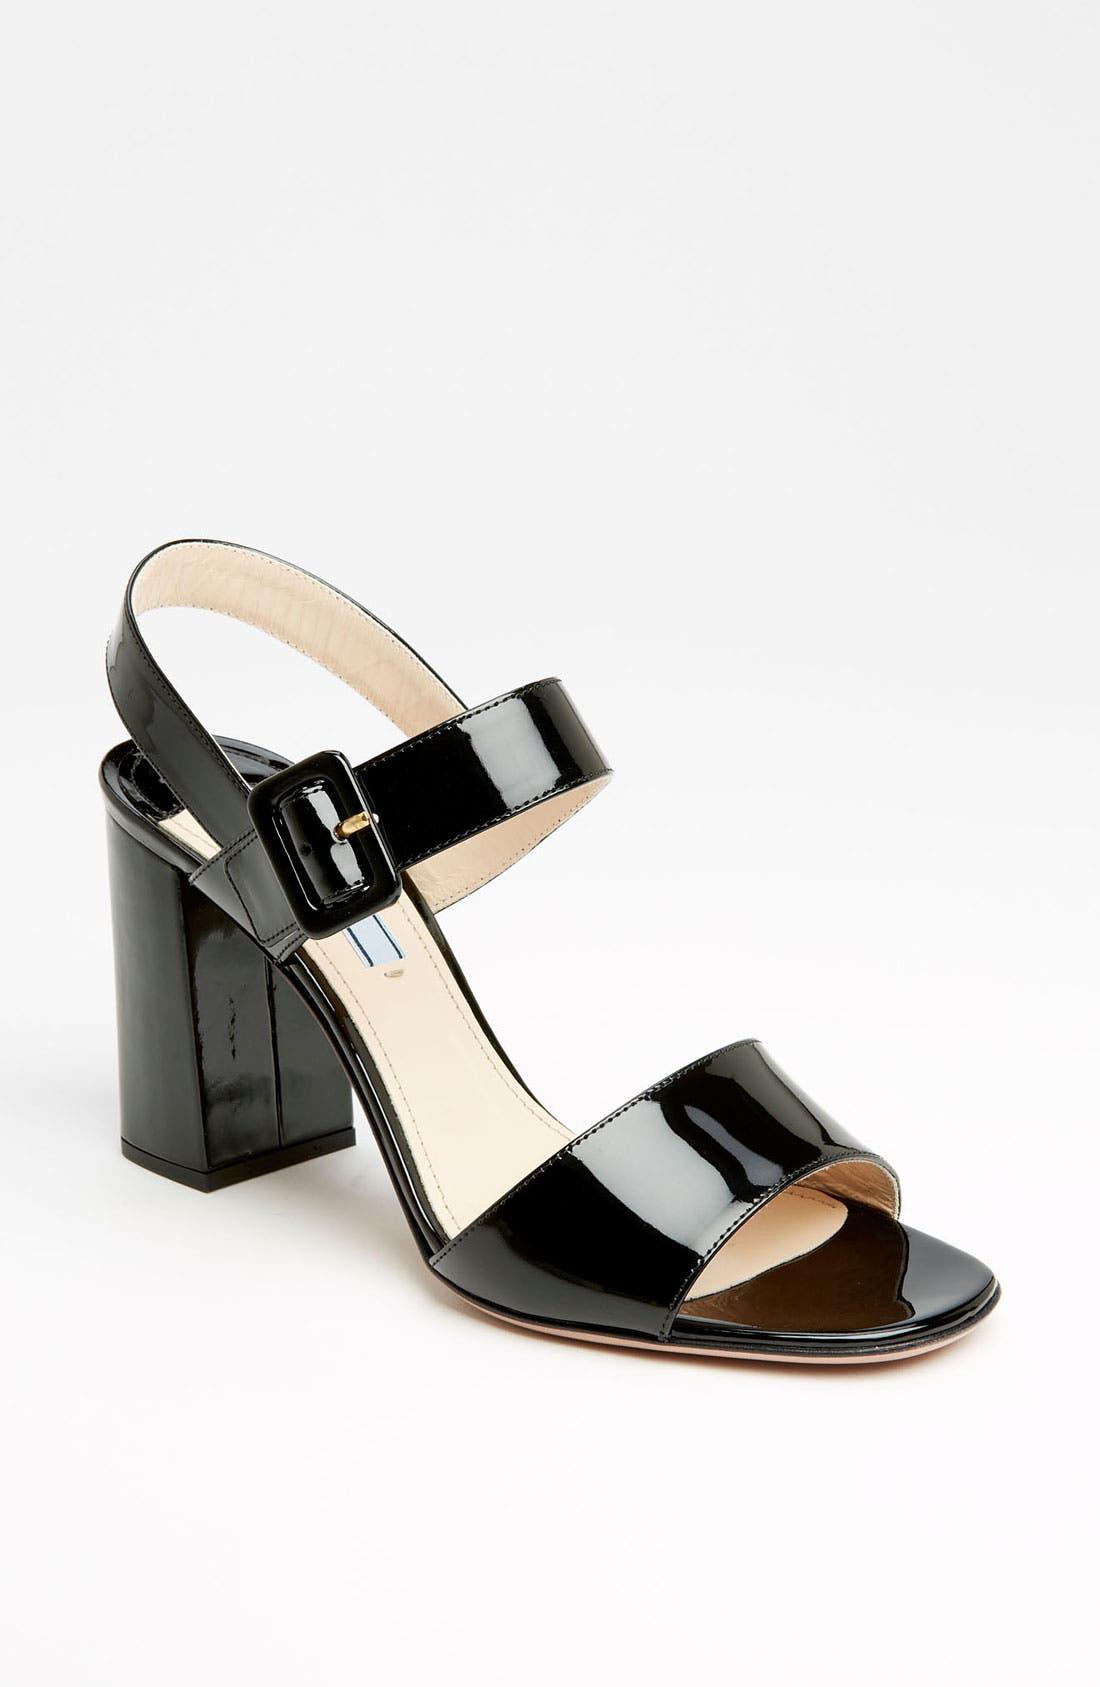 Two Strap Block Heel Sandal,                             Main thumbnail 1, color,                             001